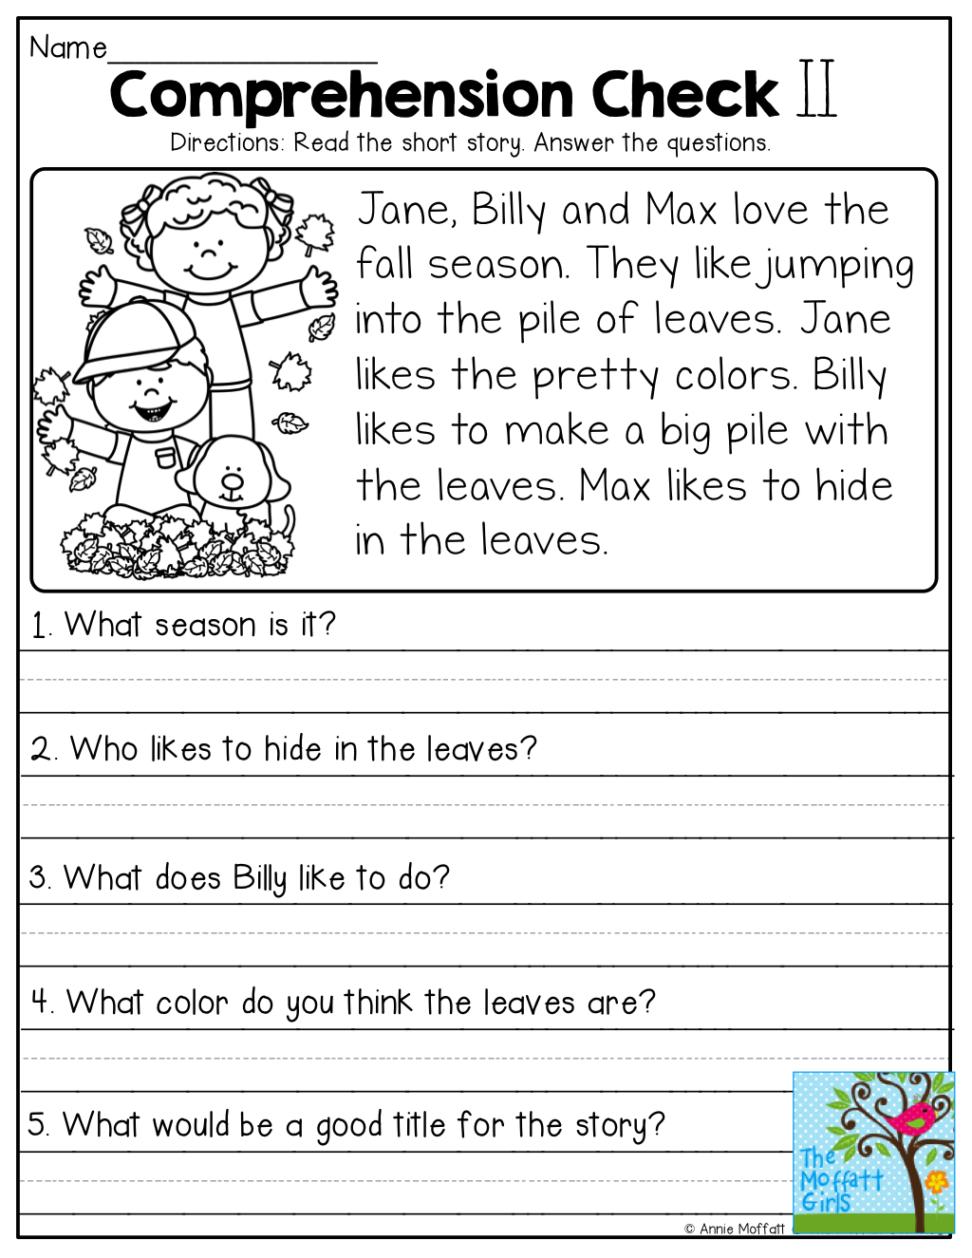 Worksheet. Free Printable Reading Comprehension Worksheets - Free Printable Reading Comprehension Worksheets Grade 5